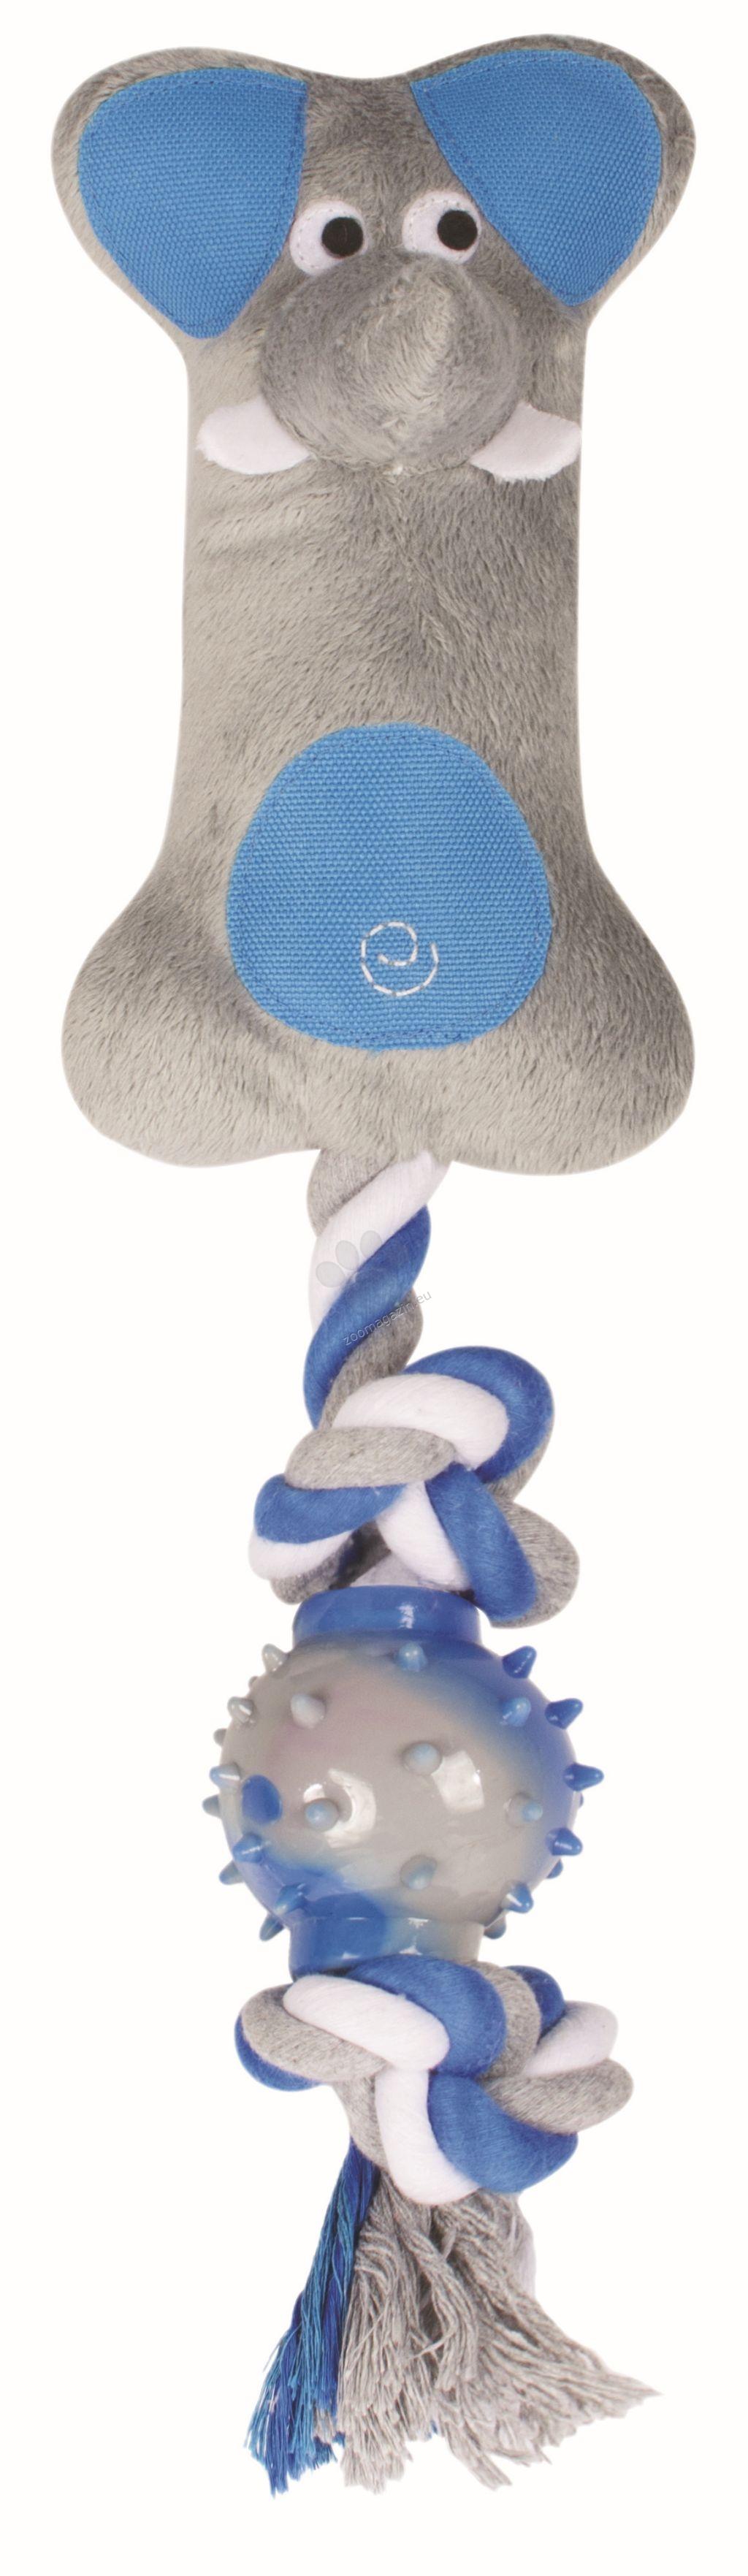 M-Pets Nobilla - играчка 37 / 10 см. / синя, зелена, оранжева, лилава /